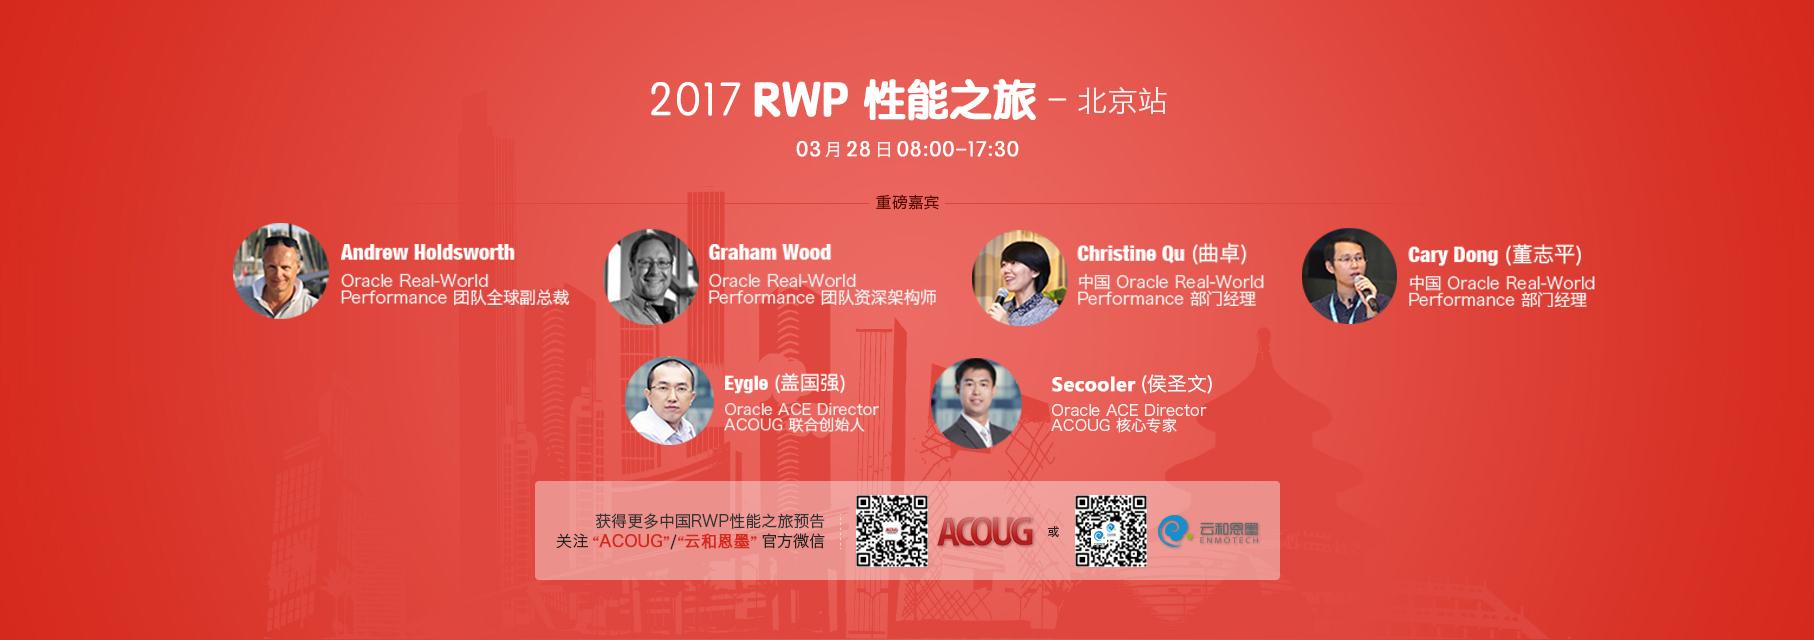 2017 Oracle RWP 性能之旅,北京站再度来袭